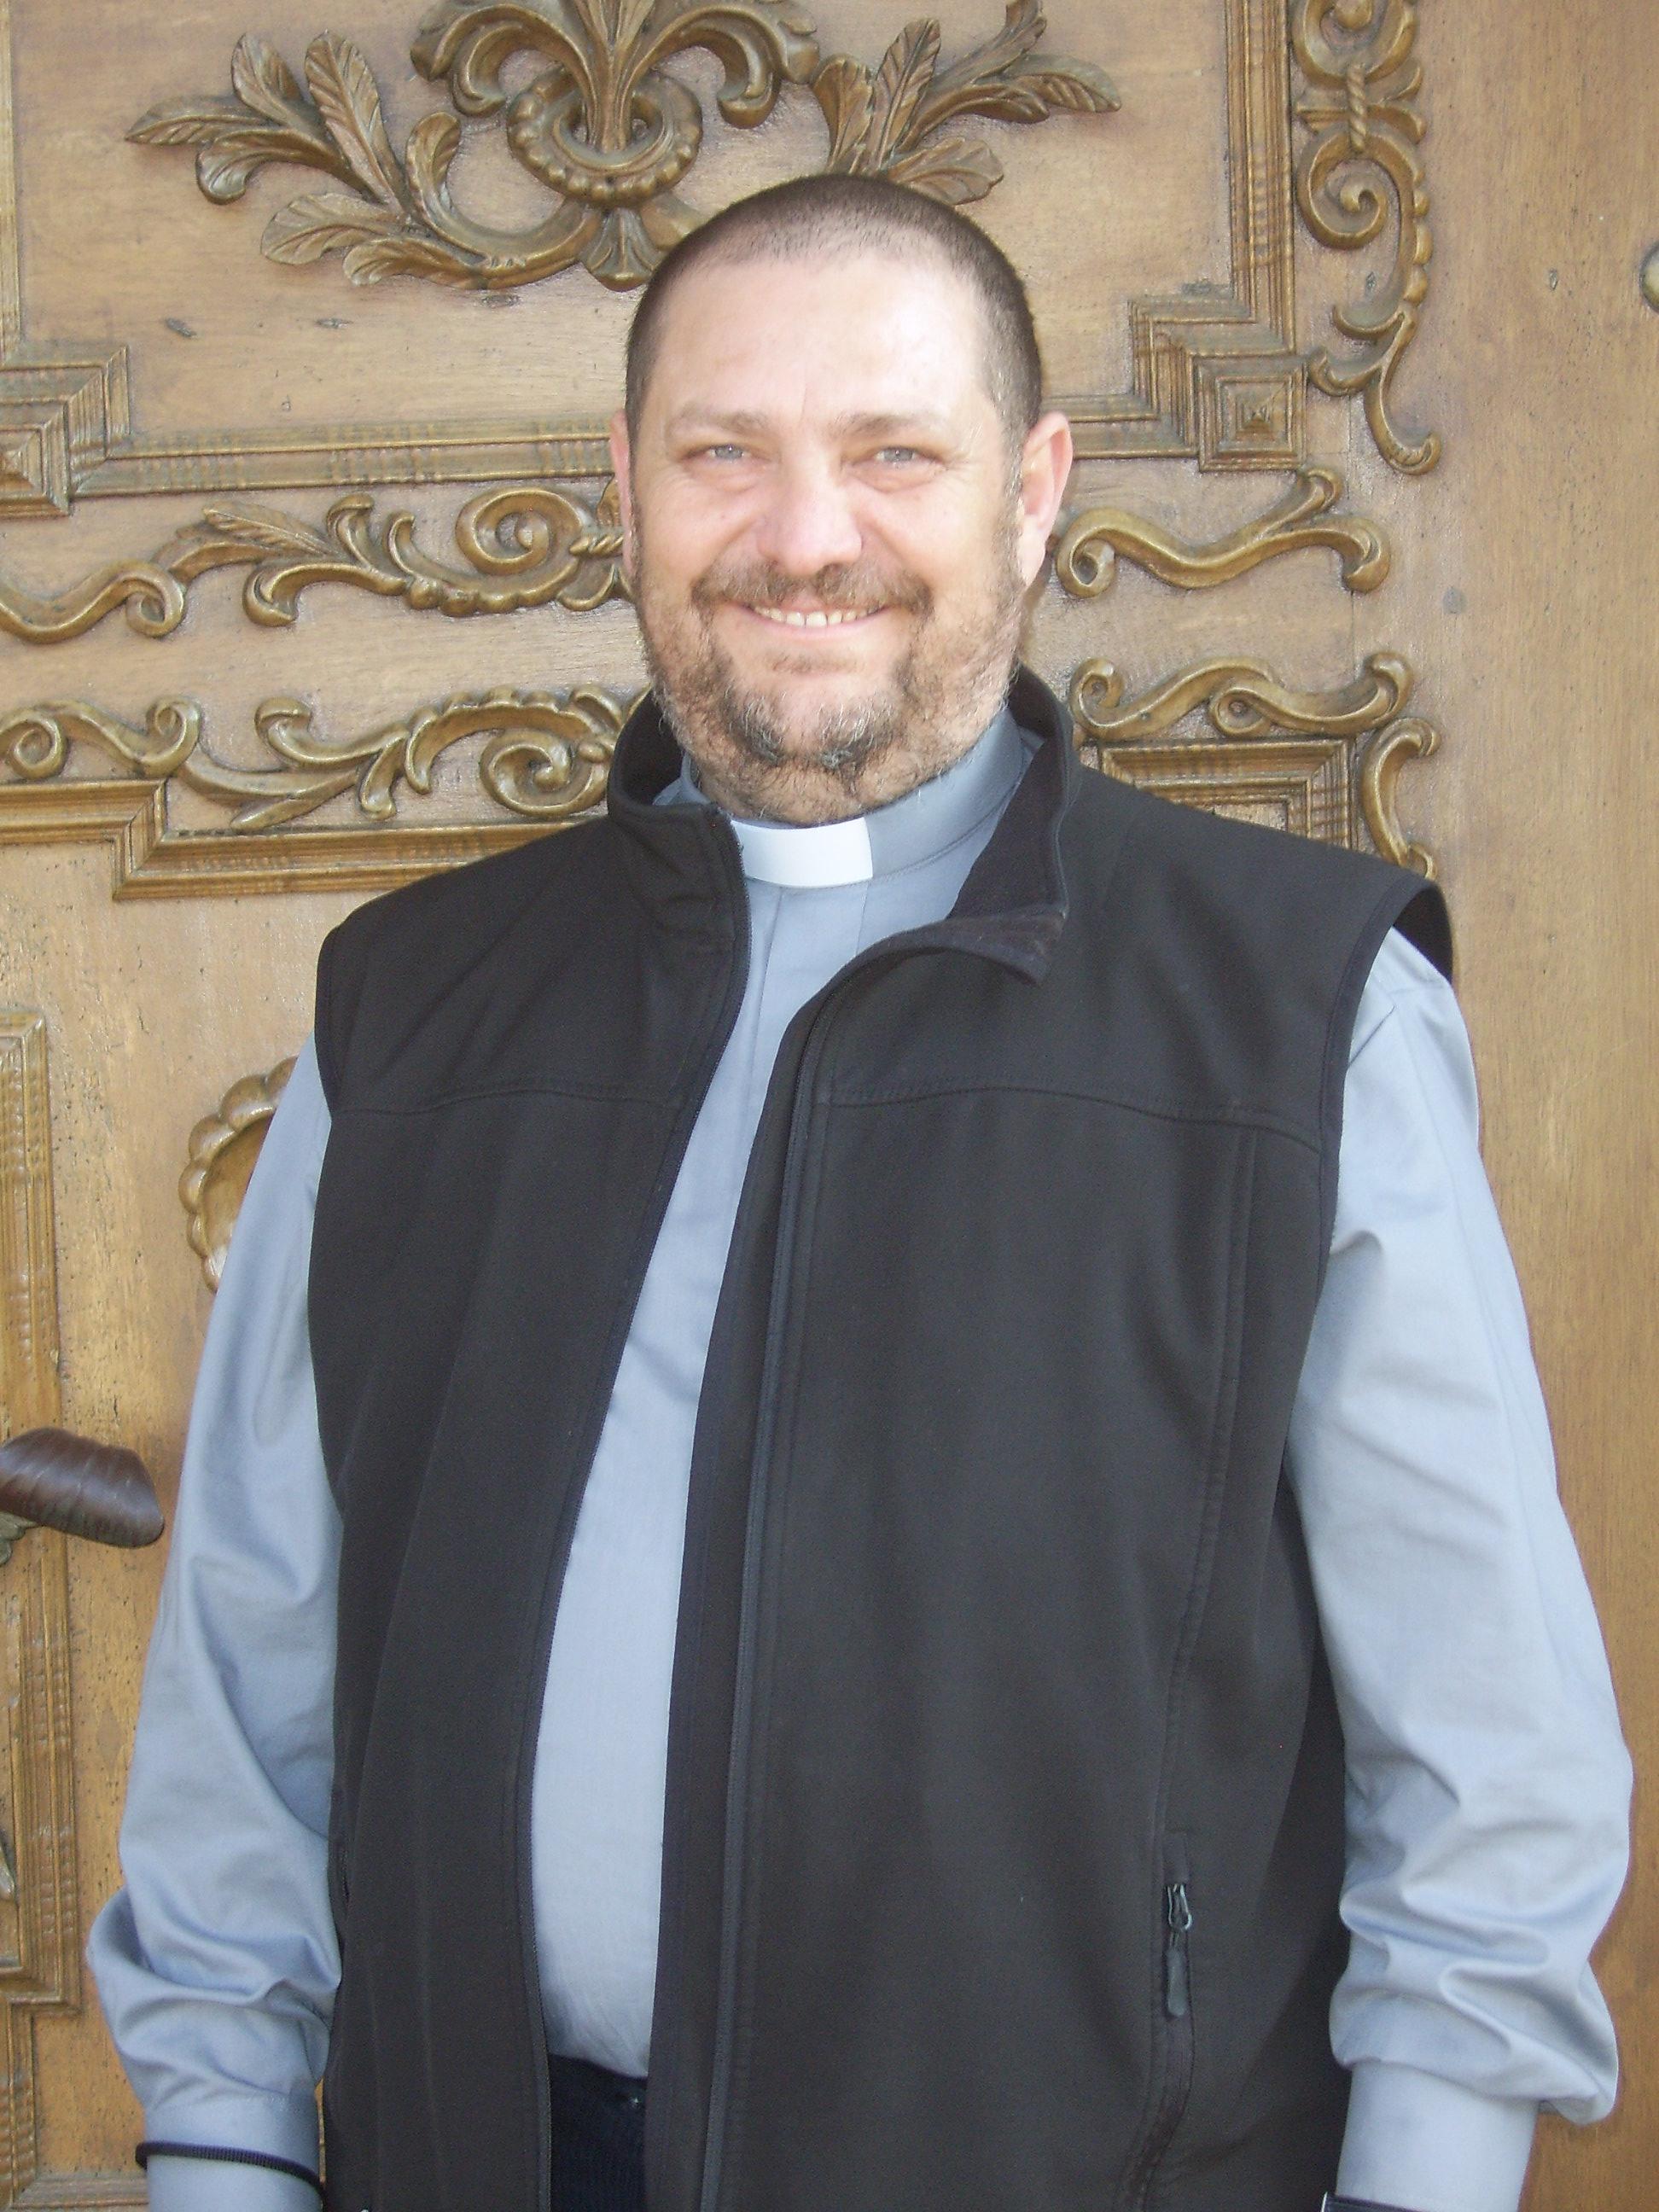 Pater Johannes Kahn SJ